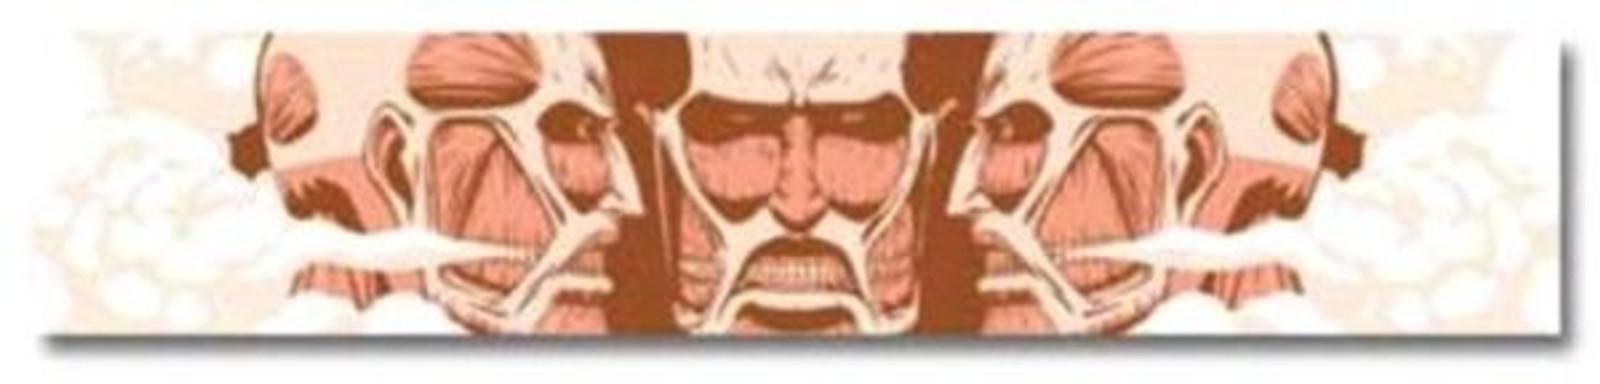 Attack on Titan Long Towel 40 inch Ichiban kuji Banpresto JAPAN ANIME MANGA